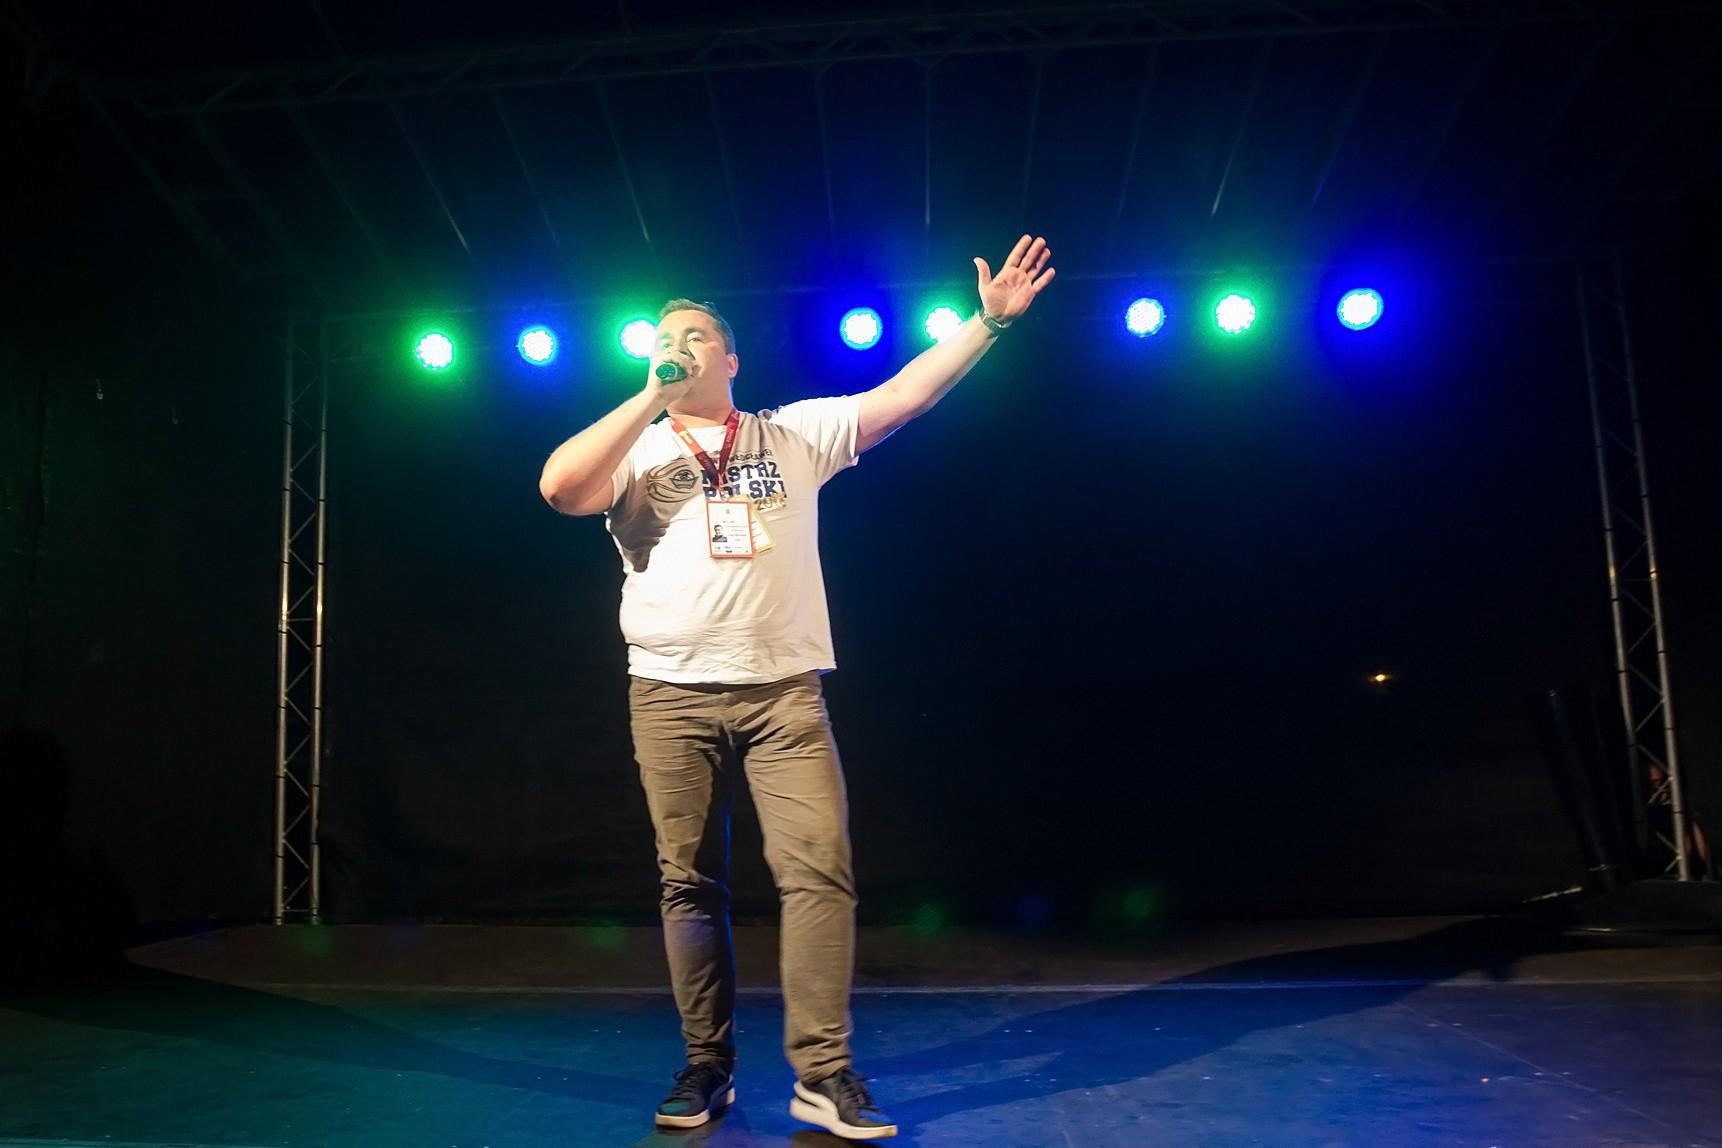 Termos z Podcastem #43: Zyskowski po Ventspils